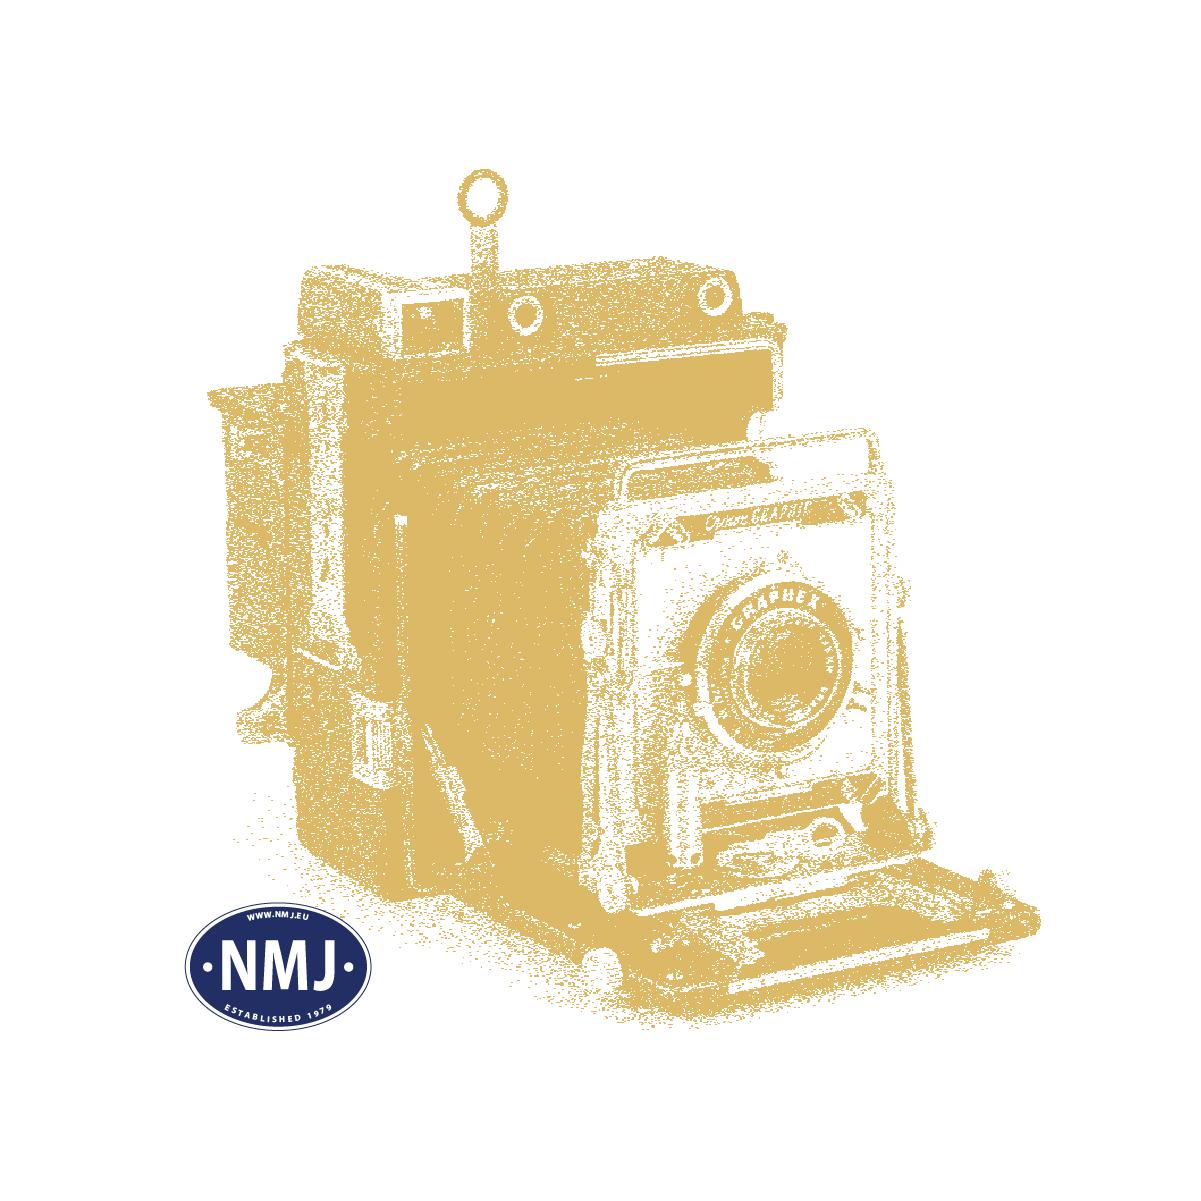 NOC14303 - Andreaskors, 8 Stk